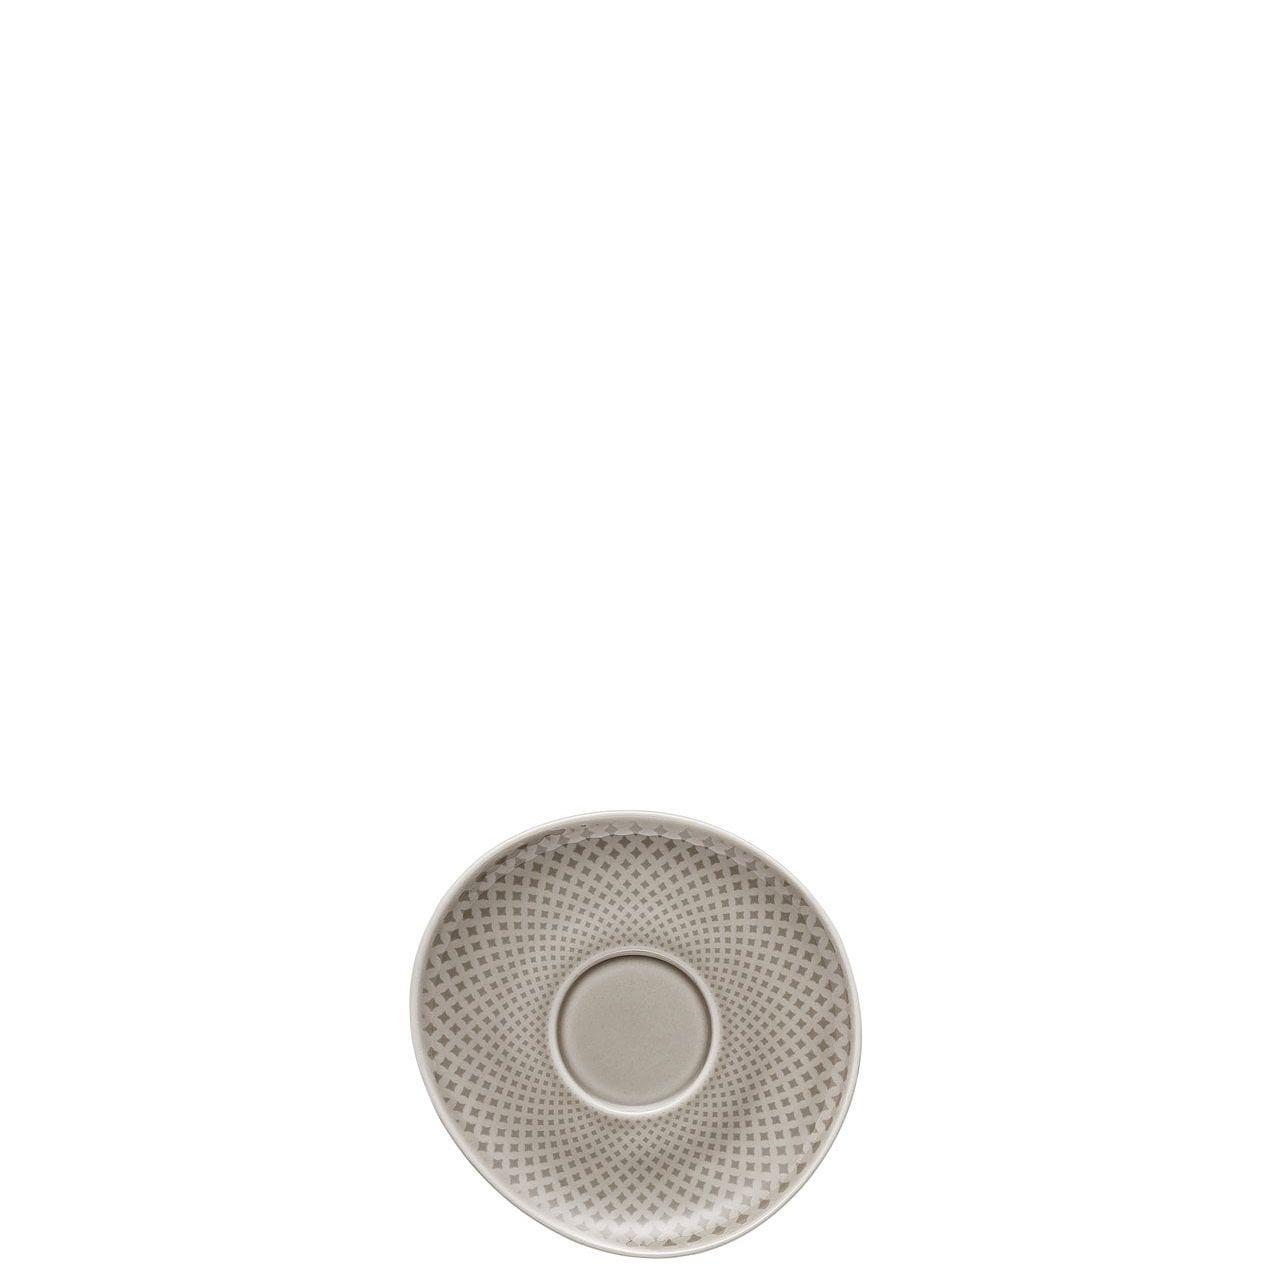 rosenthal-junto-pearl-grey-espresso-untertasse.jpg